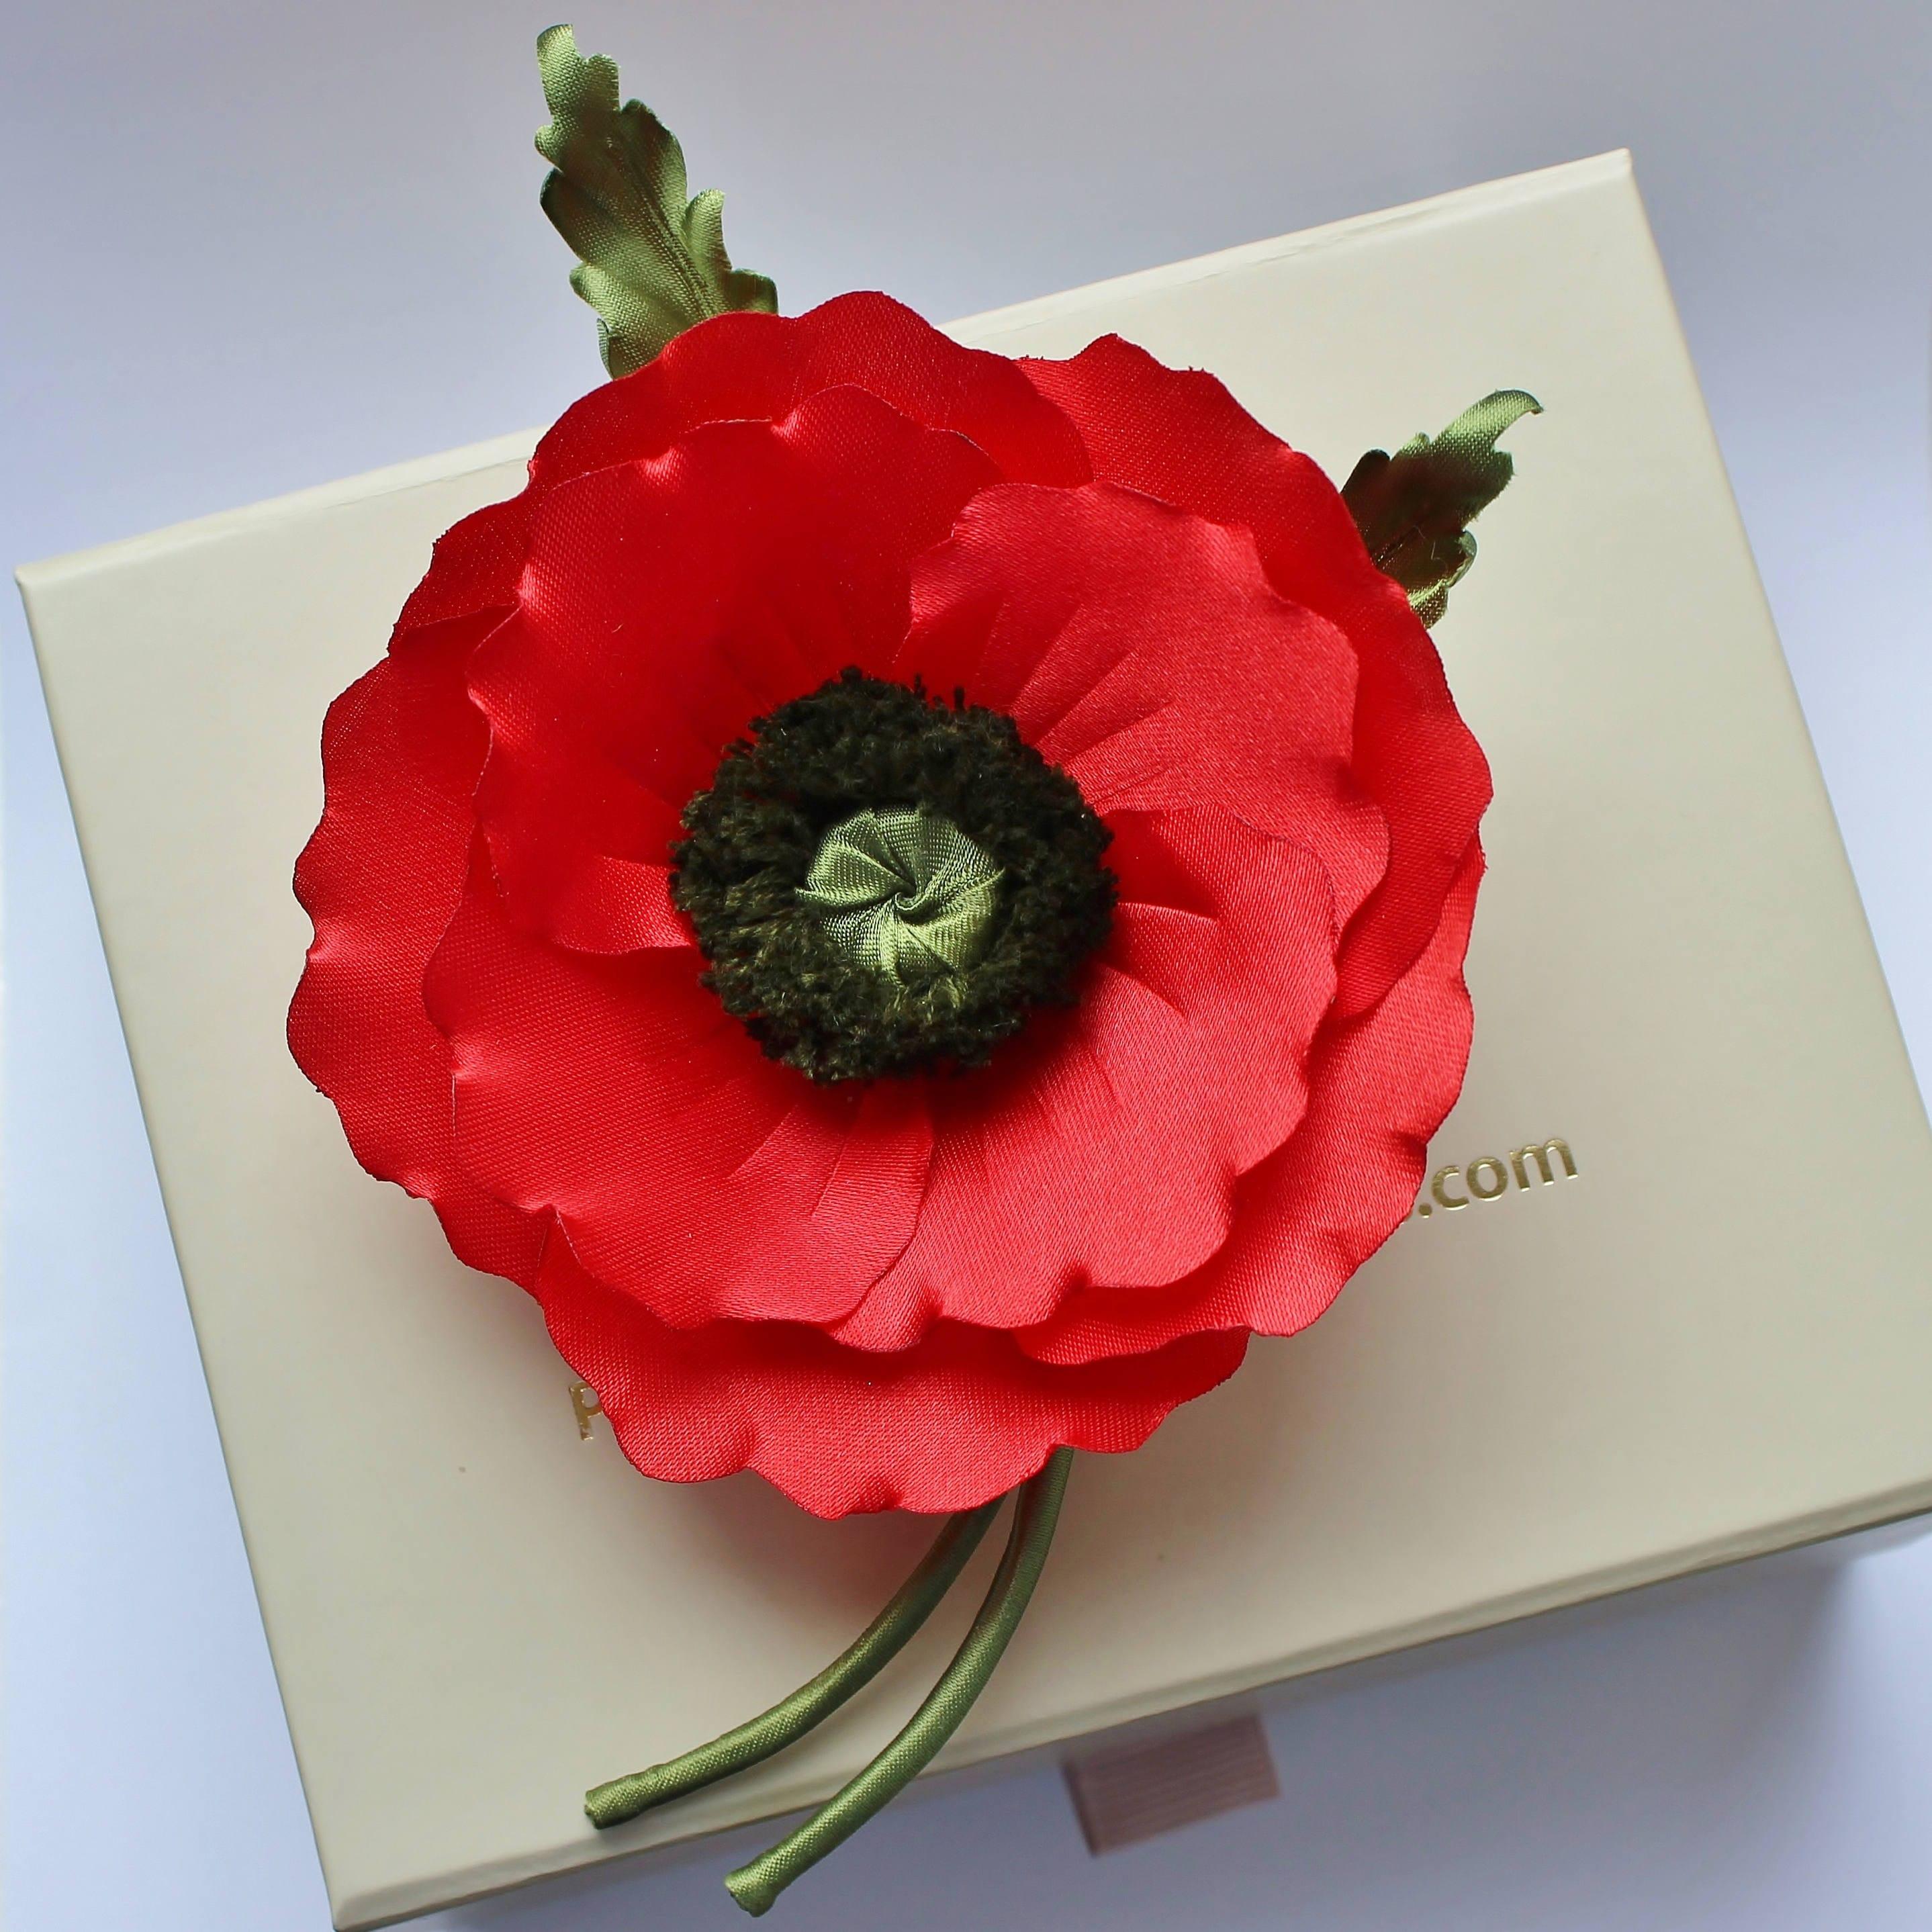 Fabric flower veterans day fabric poppy poppy corsage